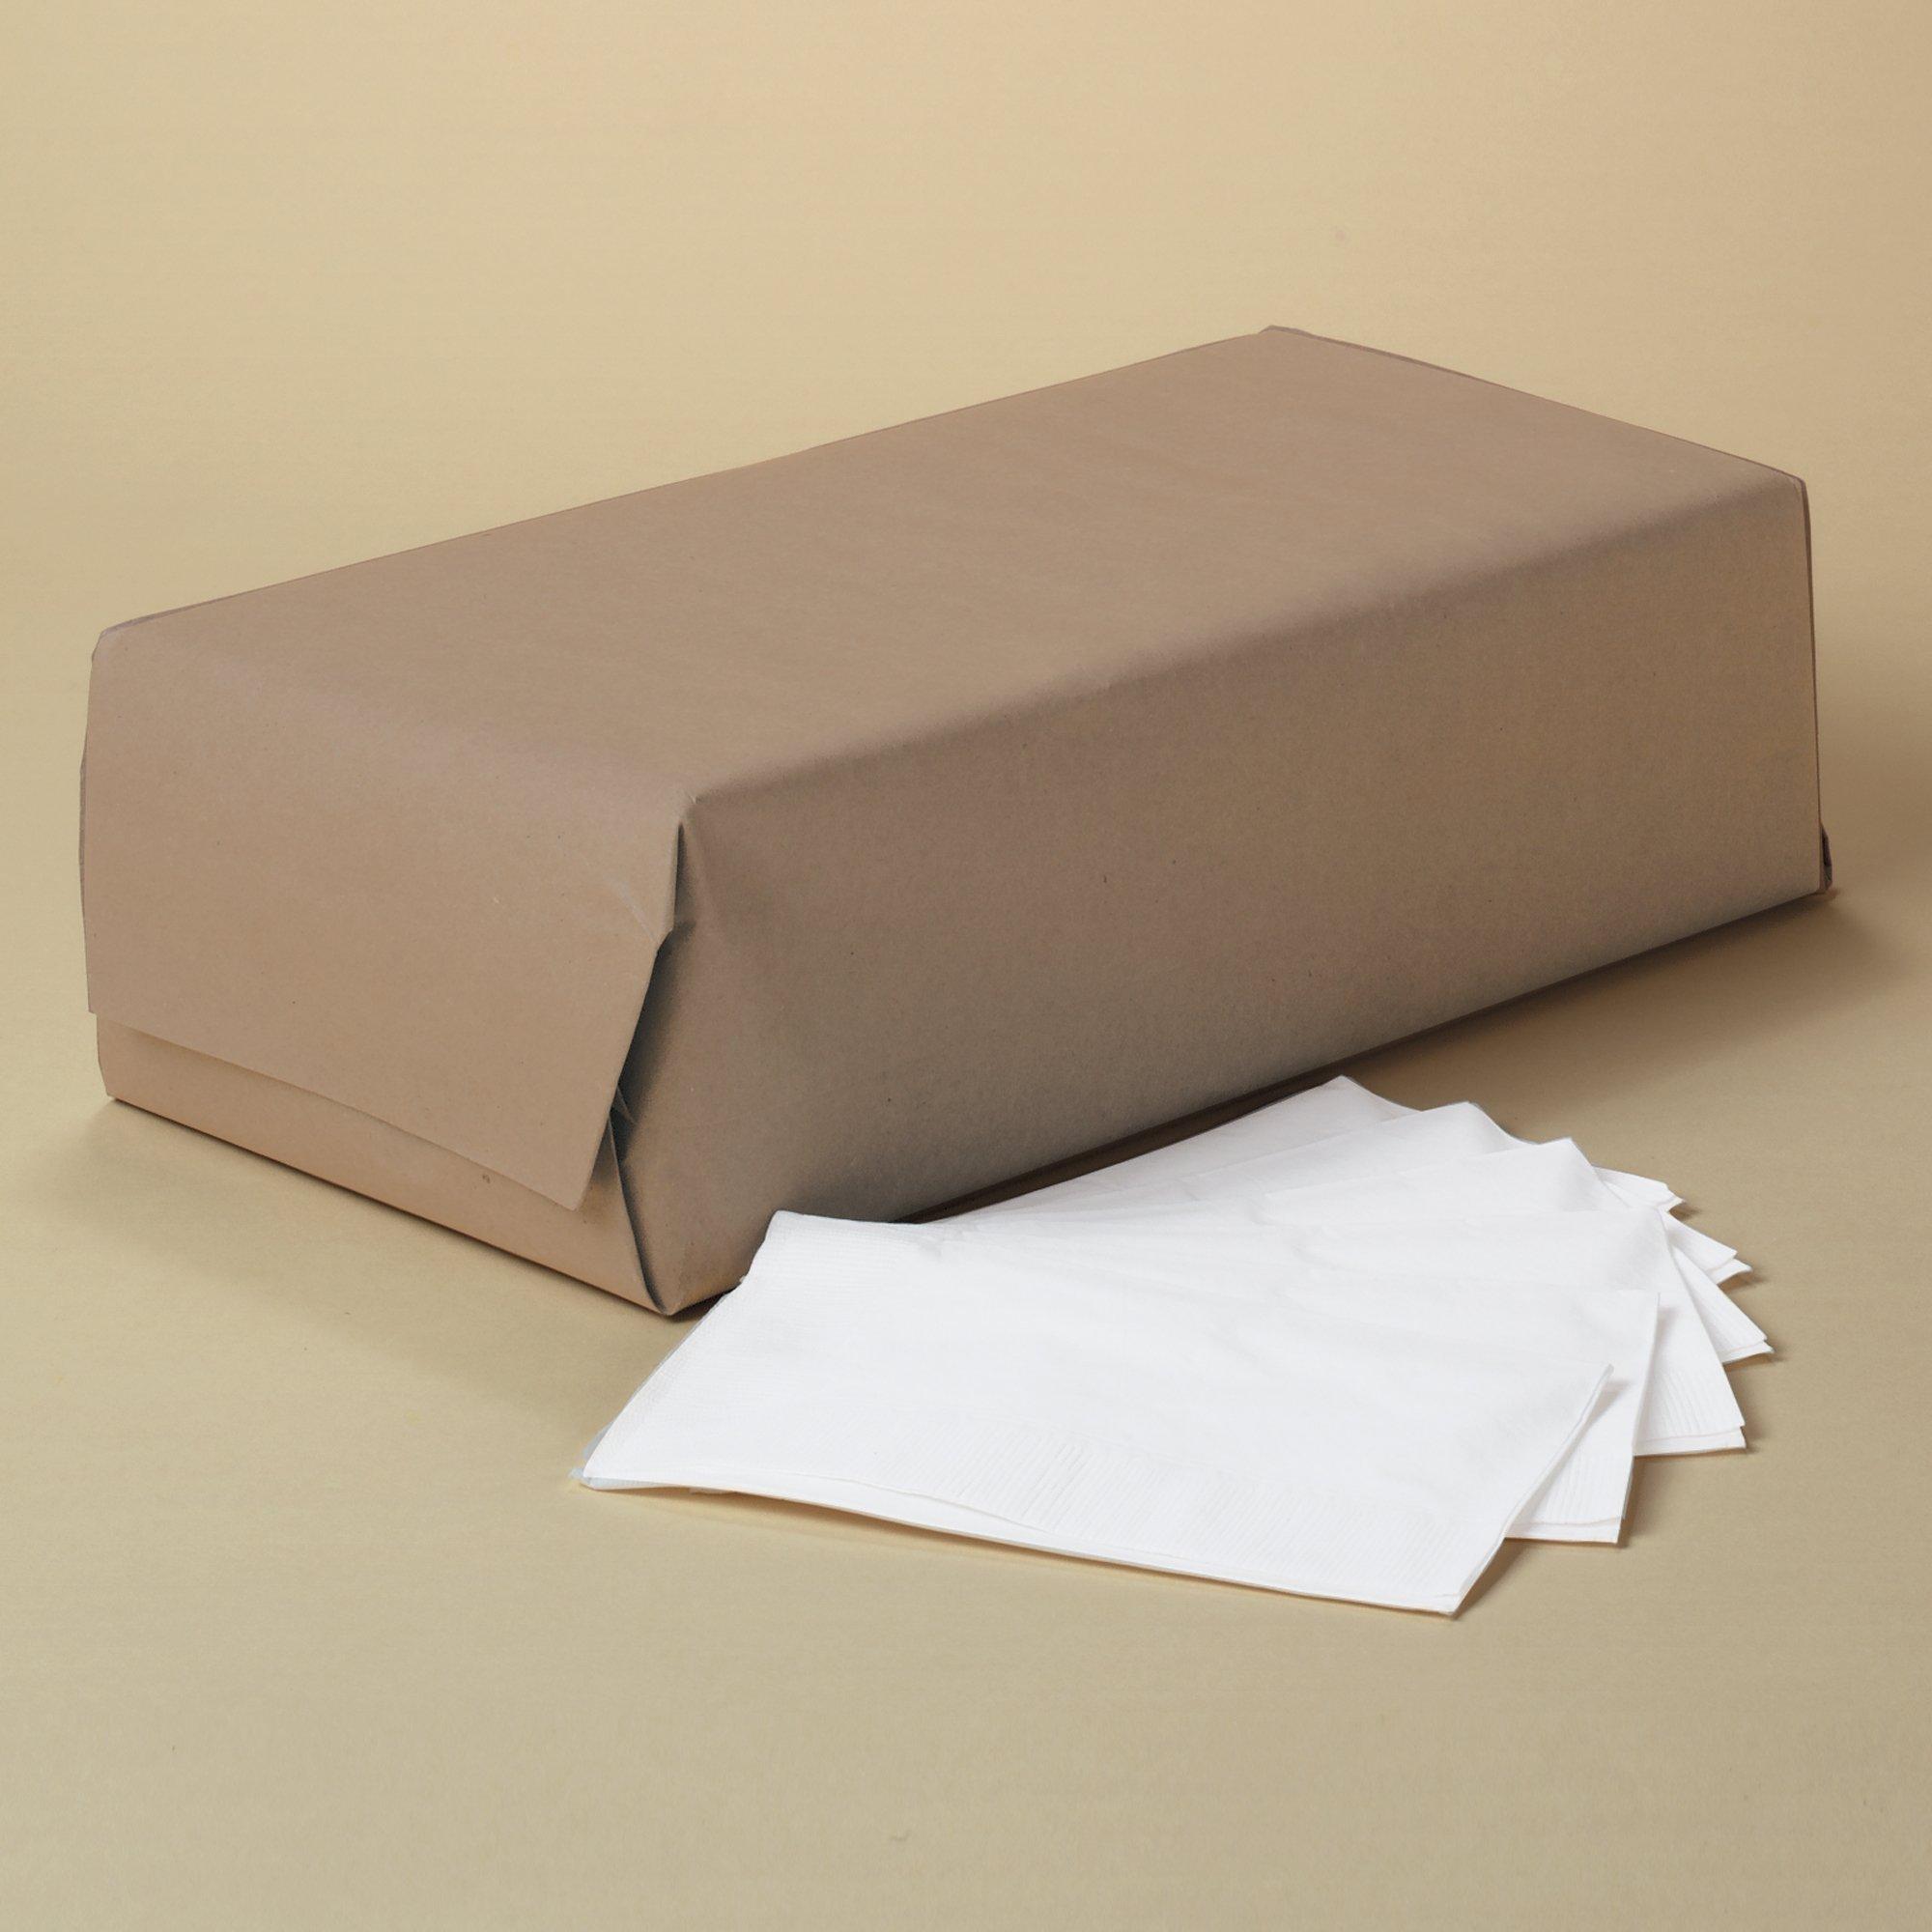 KimberlyClark Professional 98200 Scott 1/8 Fold Dinner Napkins 2 Ply White by Kimberly-Clark Professional (Image #6)